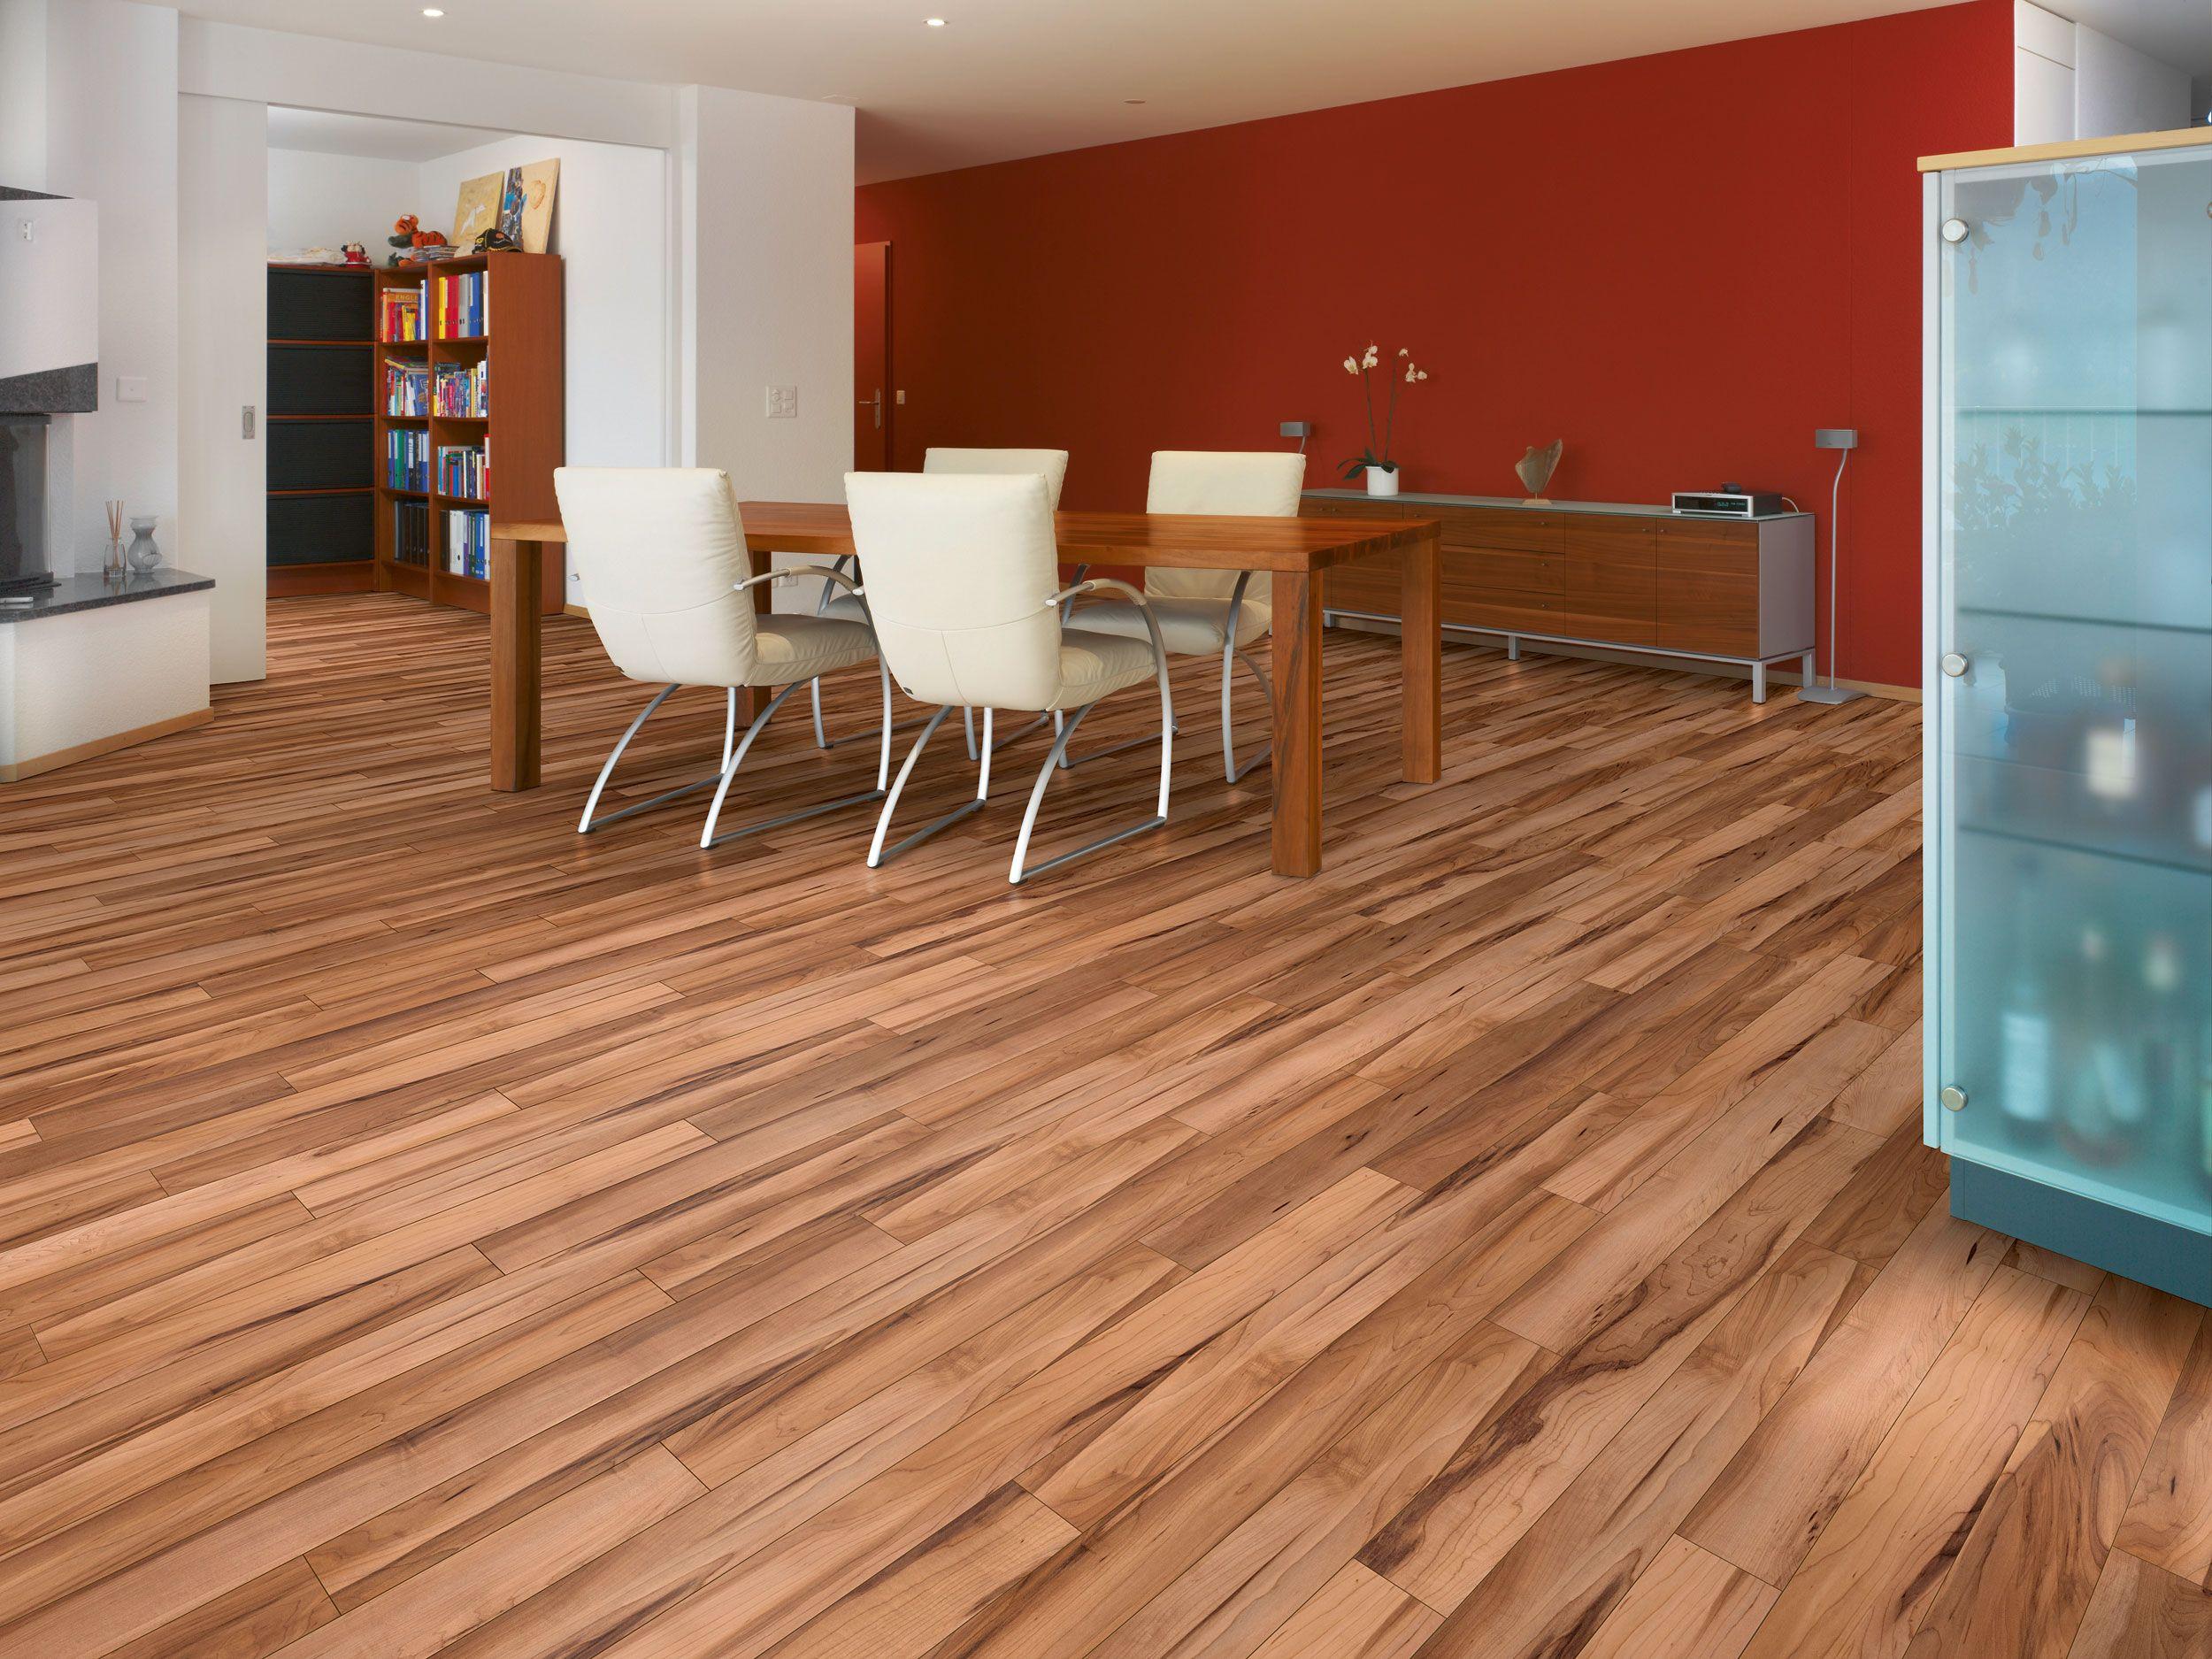 Flooring Flooring Laminate Flooring Laminate Flooring Basement